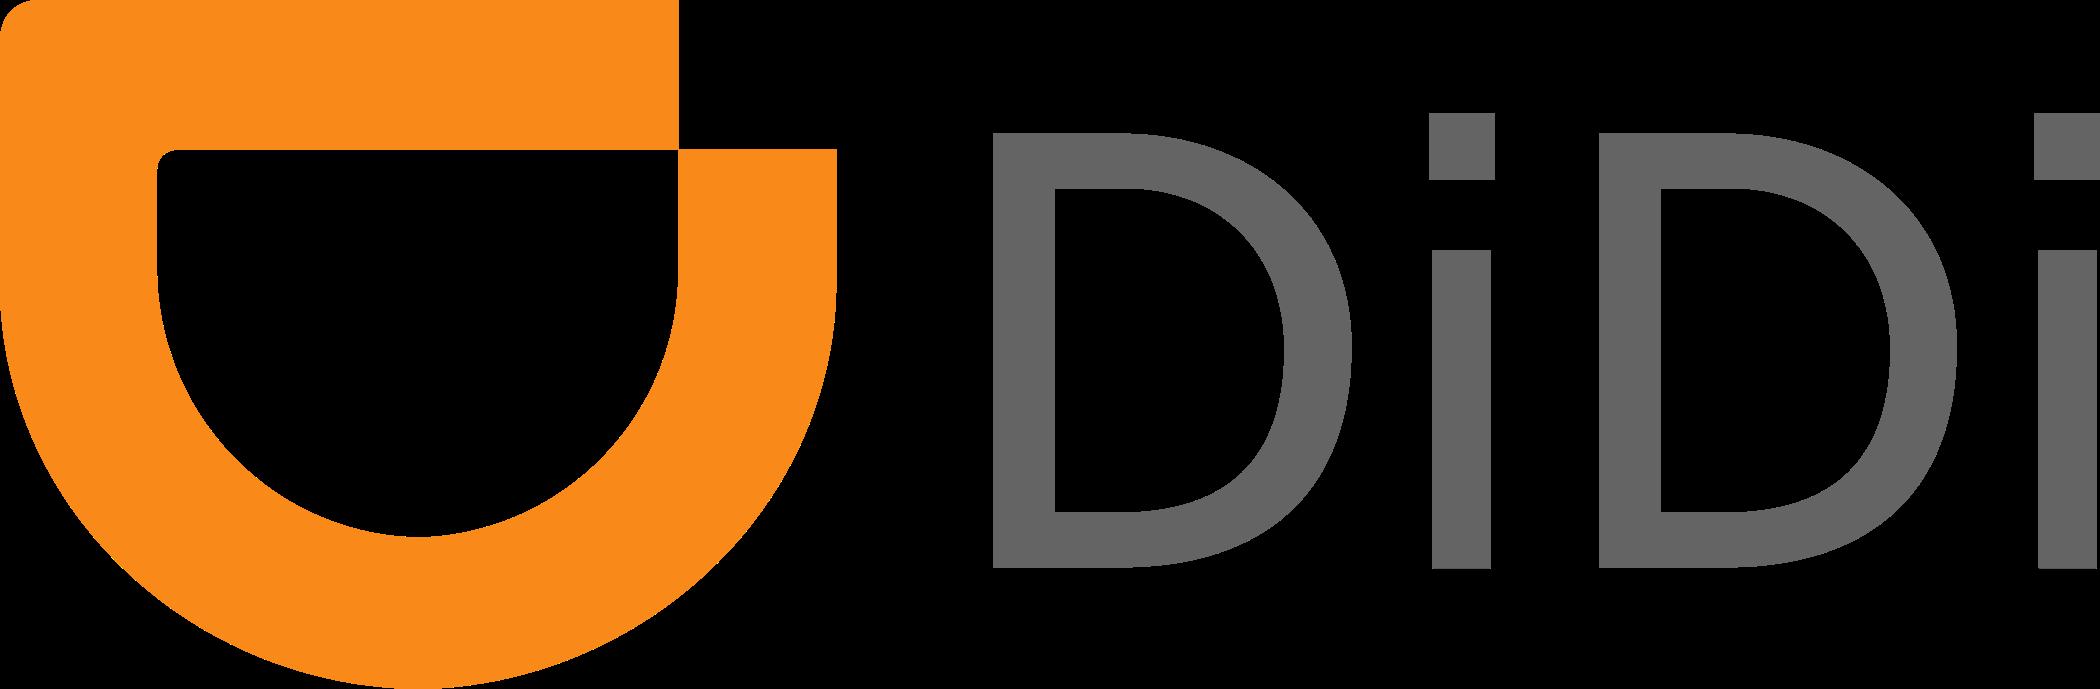 didi logo 1 - Didi Logo